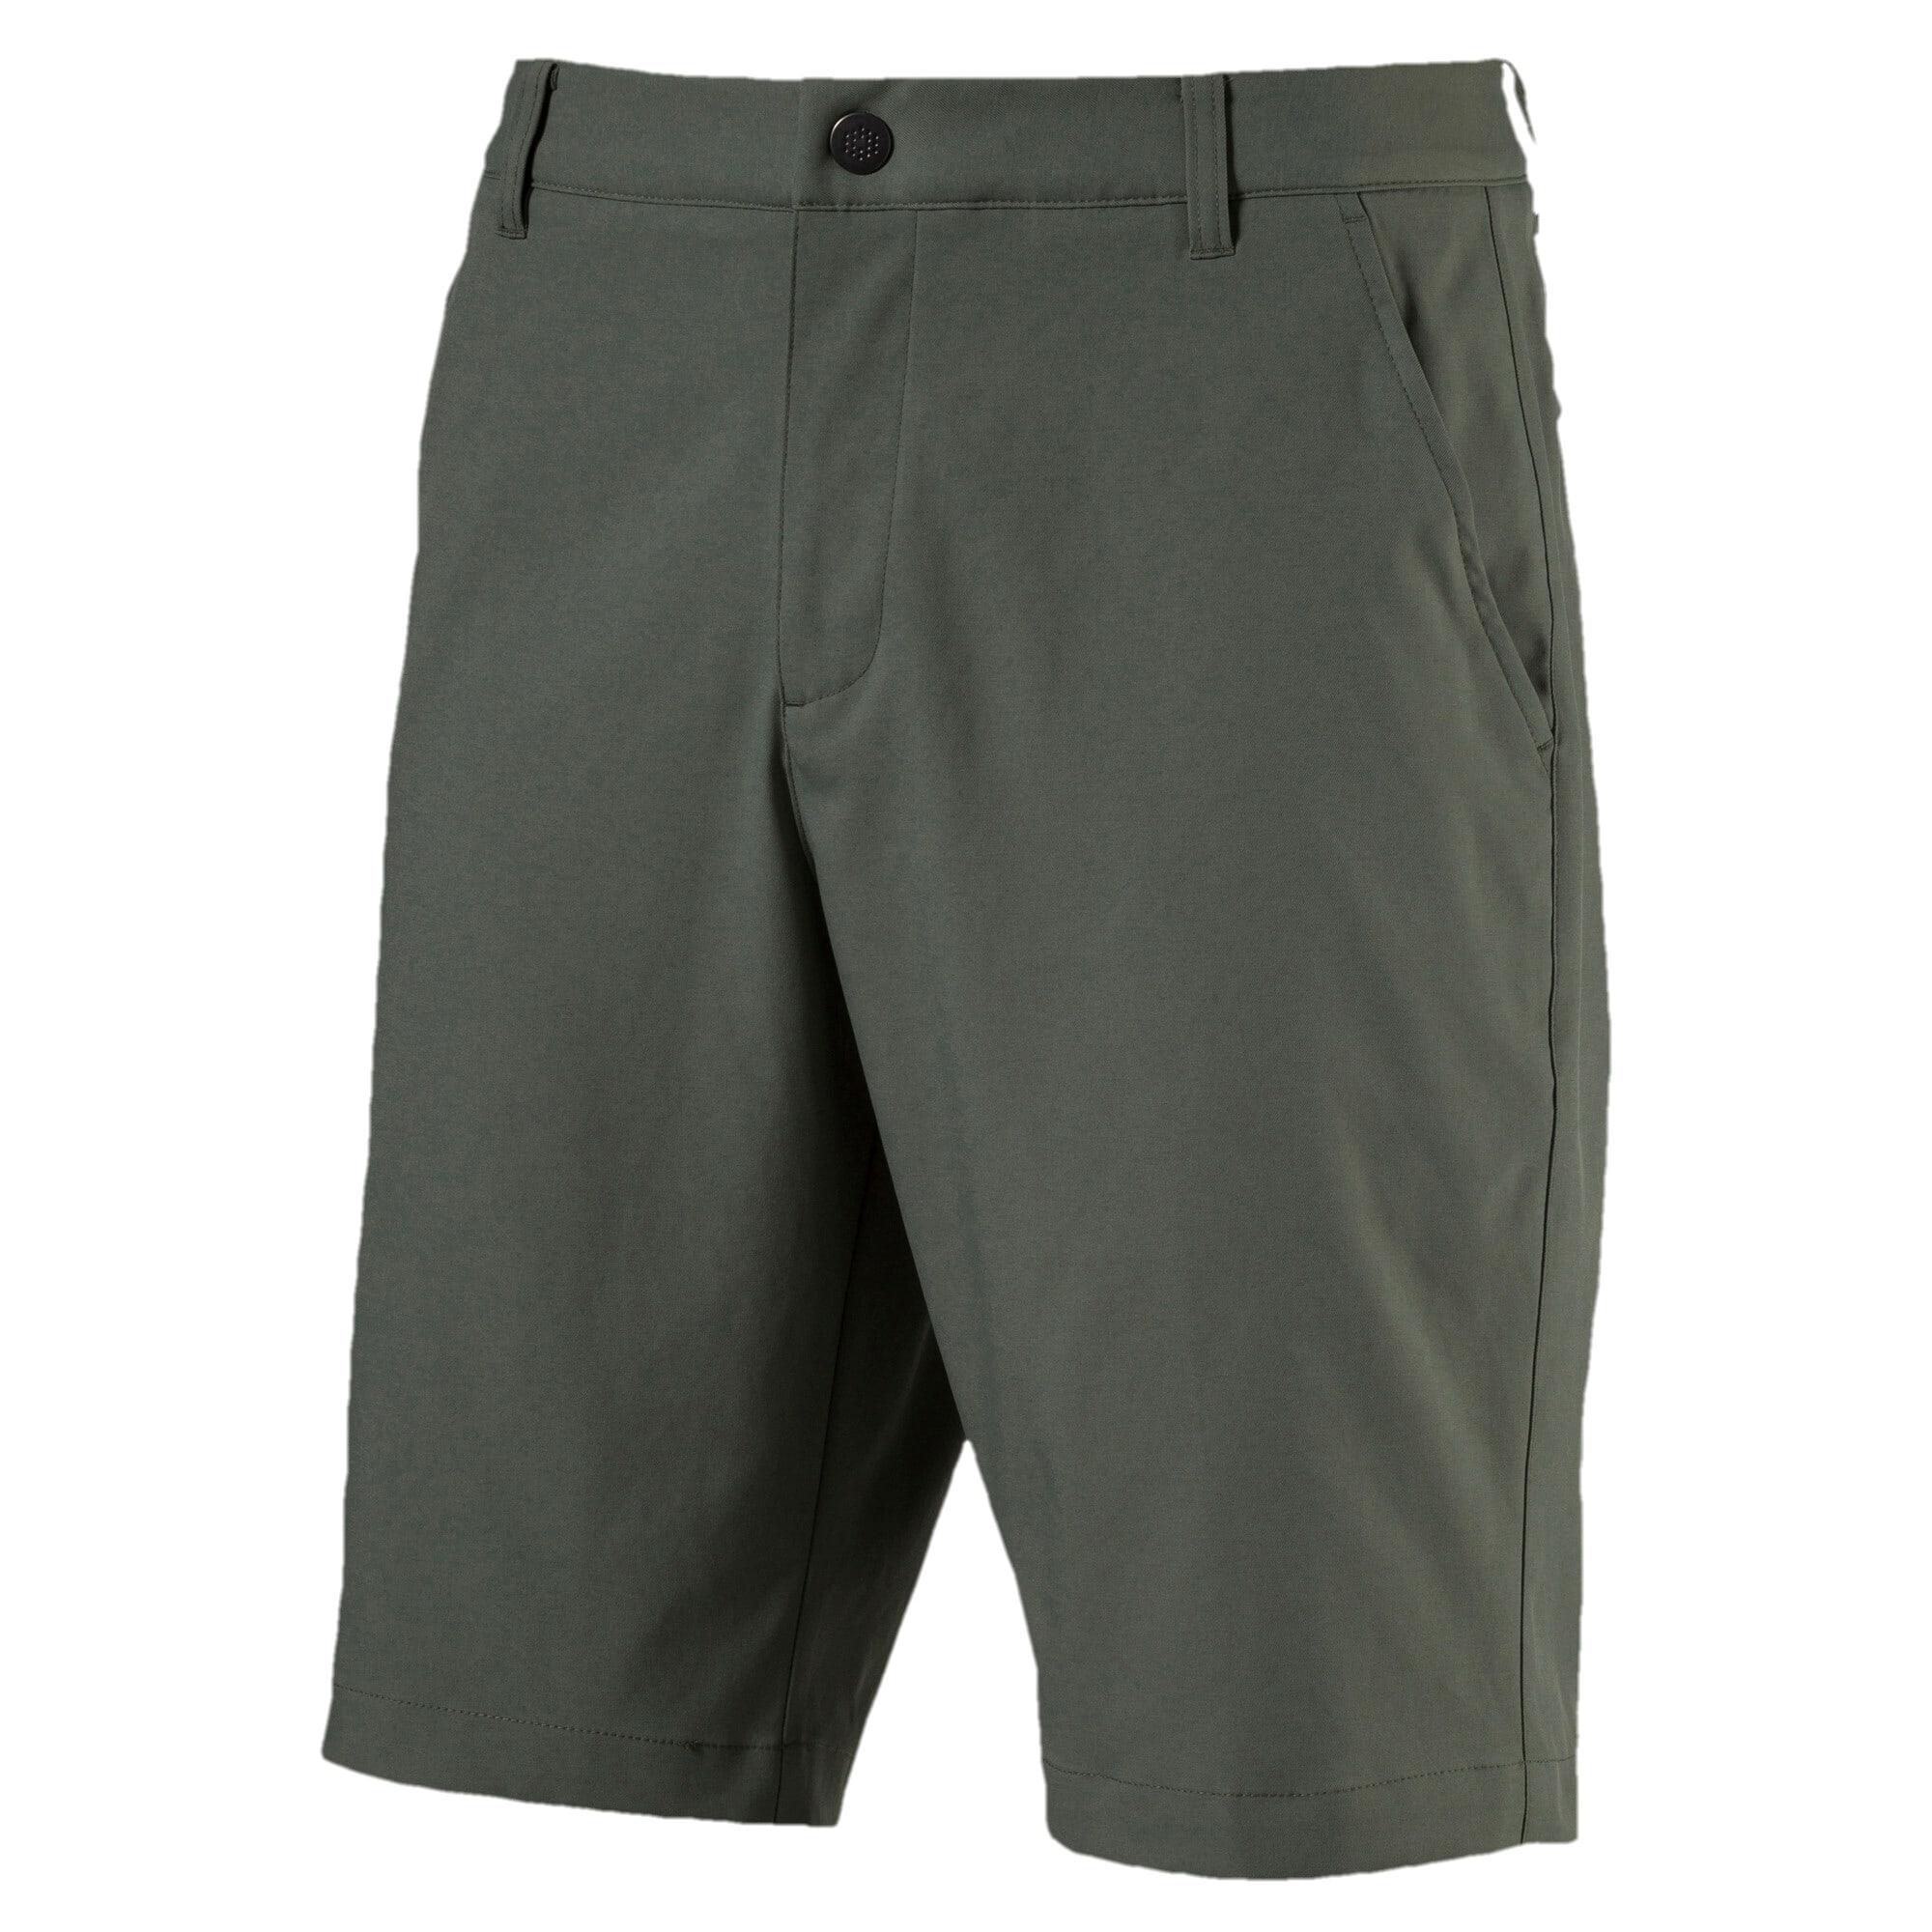 Thumbnail 1 of Men's Essential Pounce Shorts, Laurel Wreath, medium